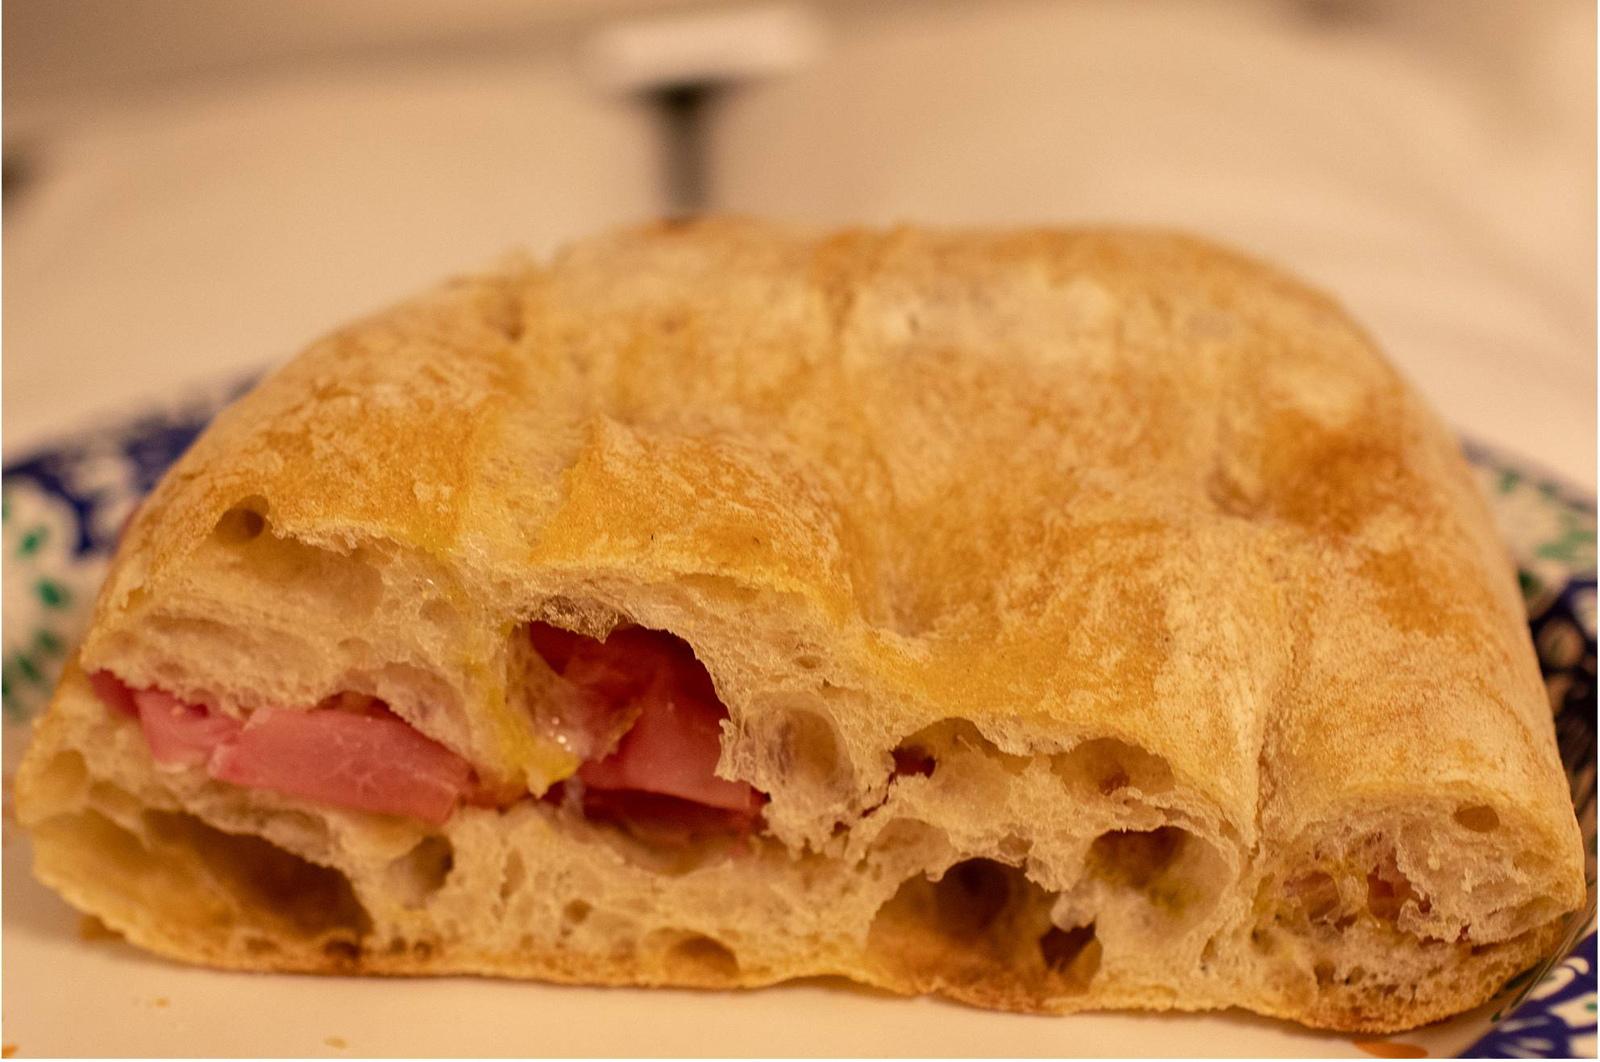 Schiacciata sandwich with meat